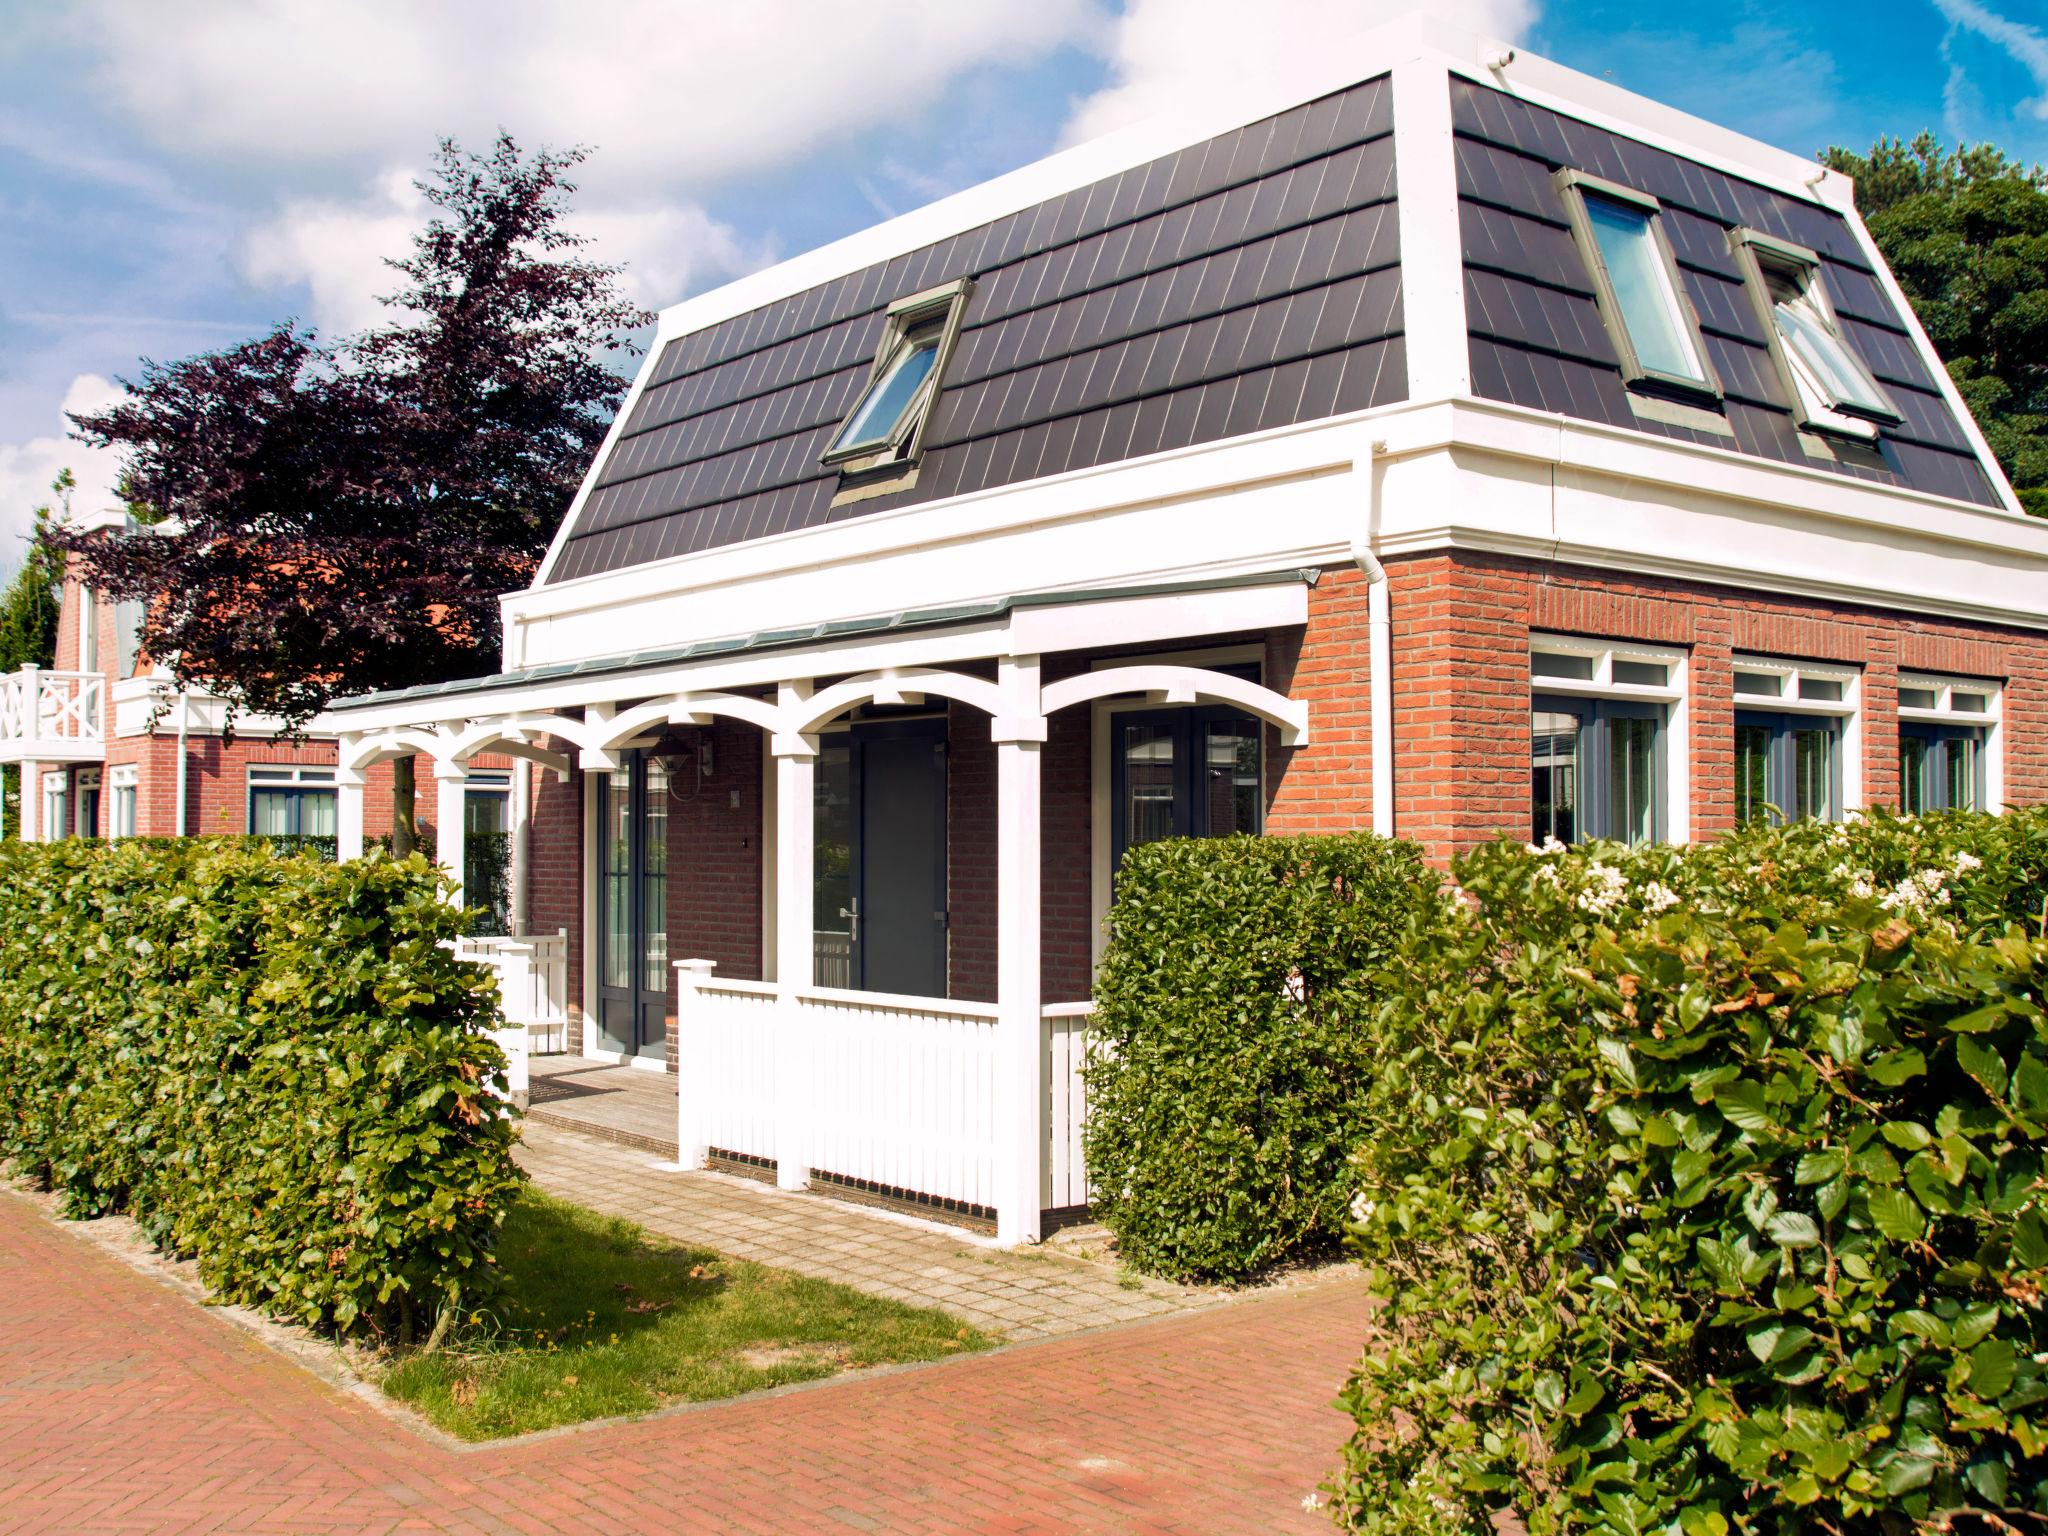 Korting vakantiehuisje Kust Nederland 🏕️Bungalowparck Tulp & Zee